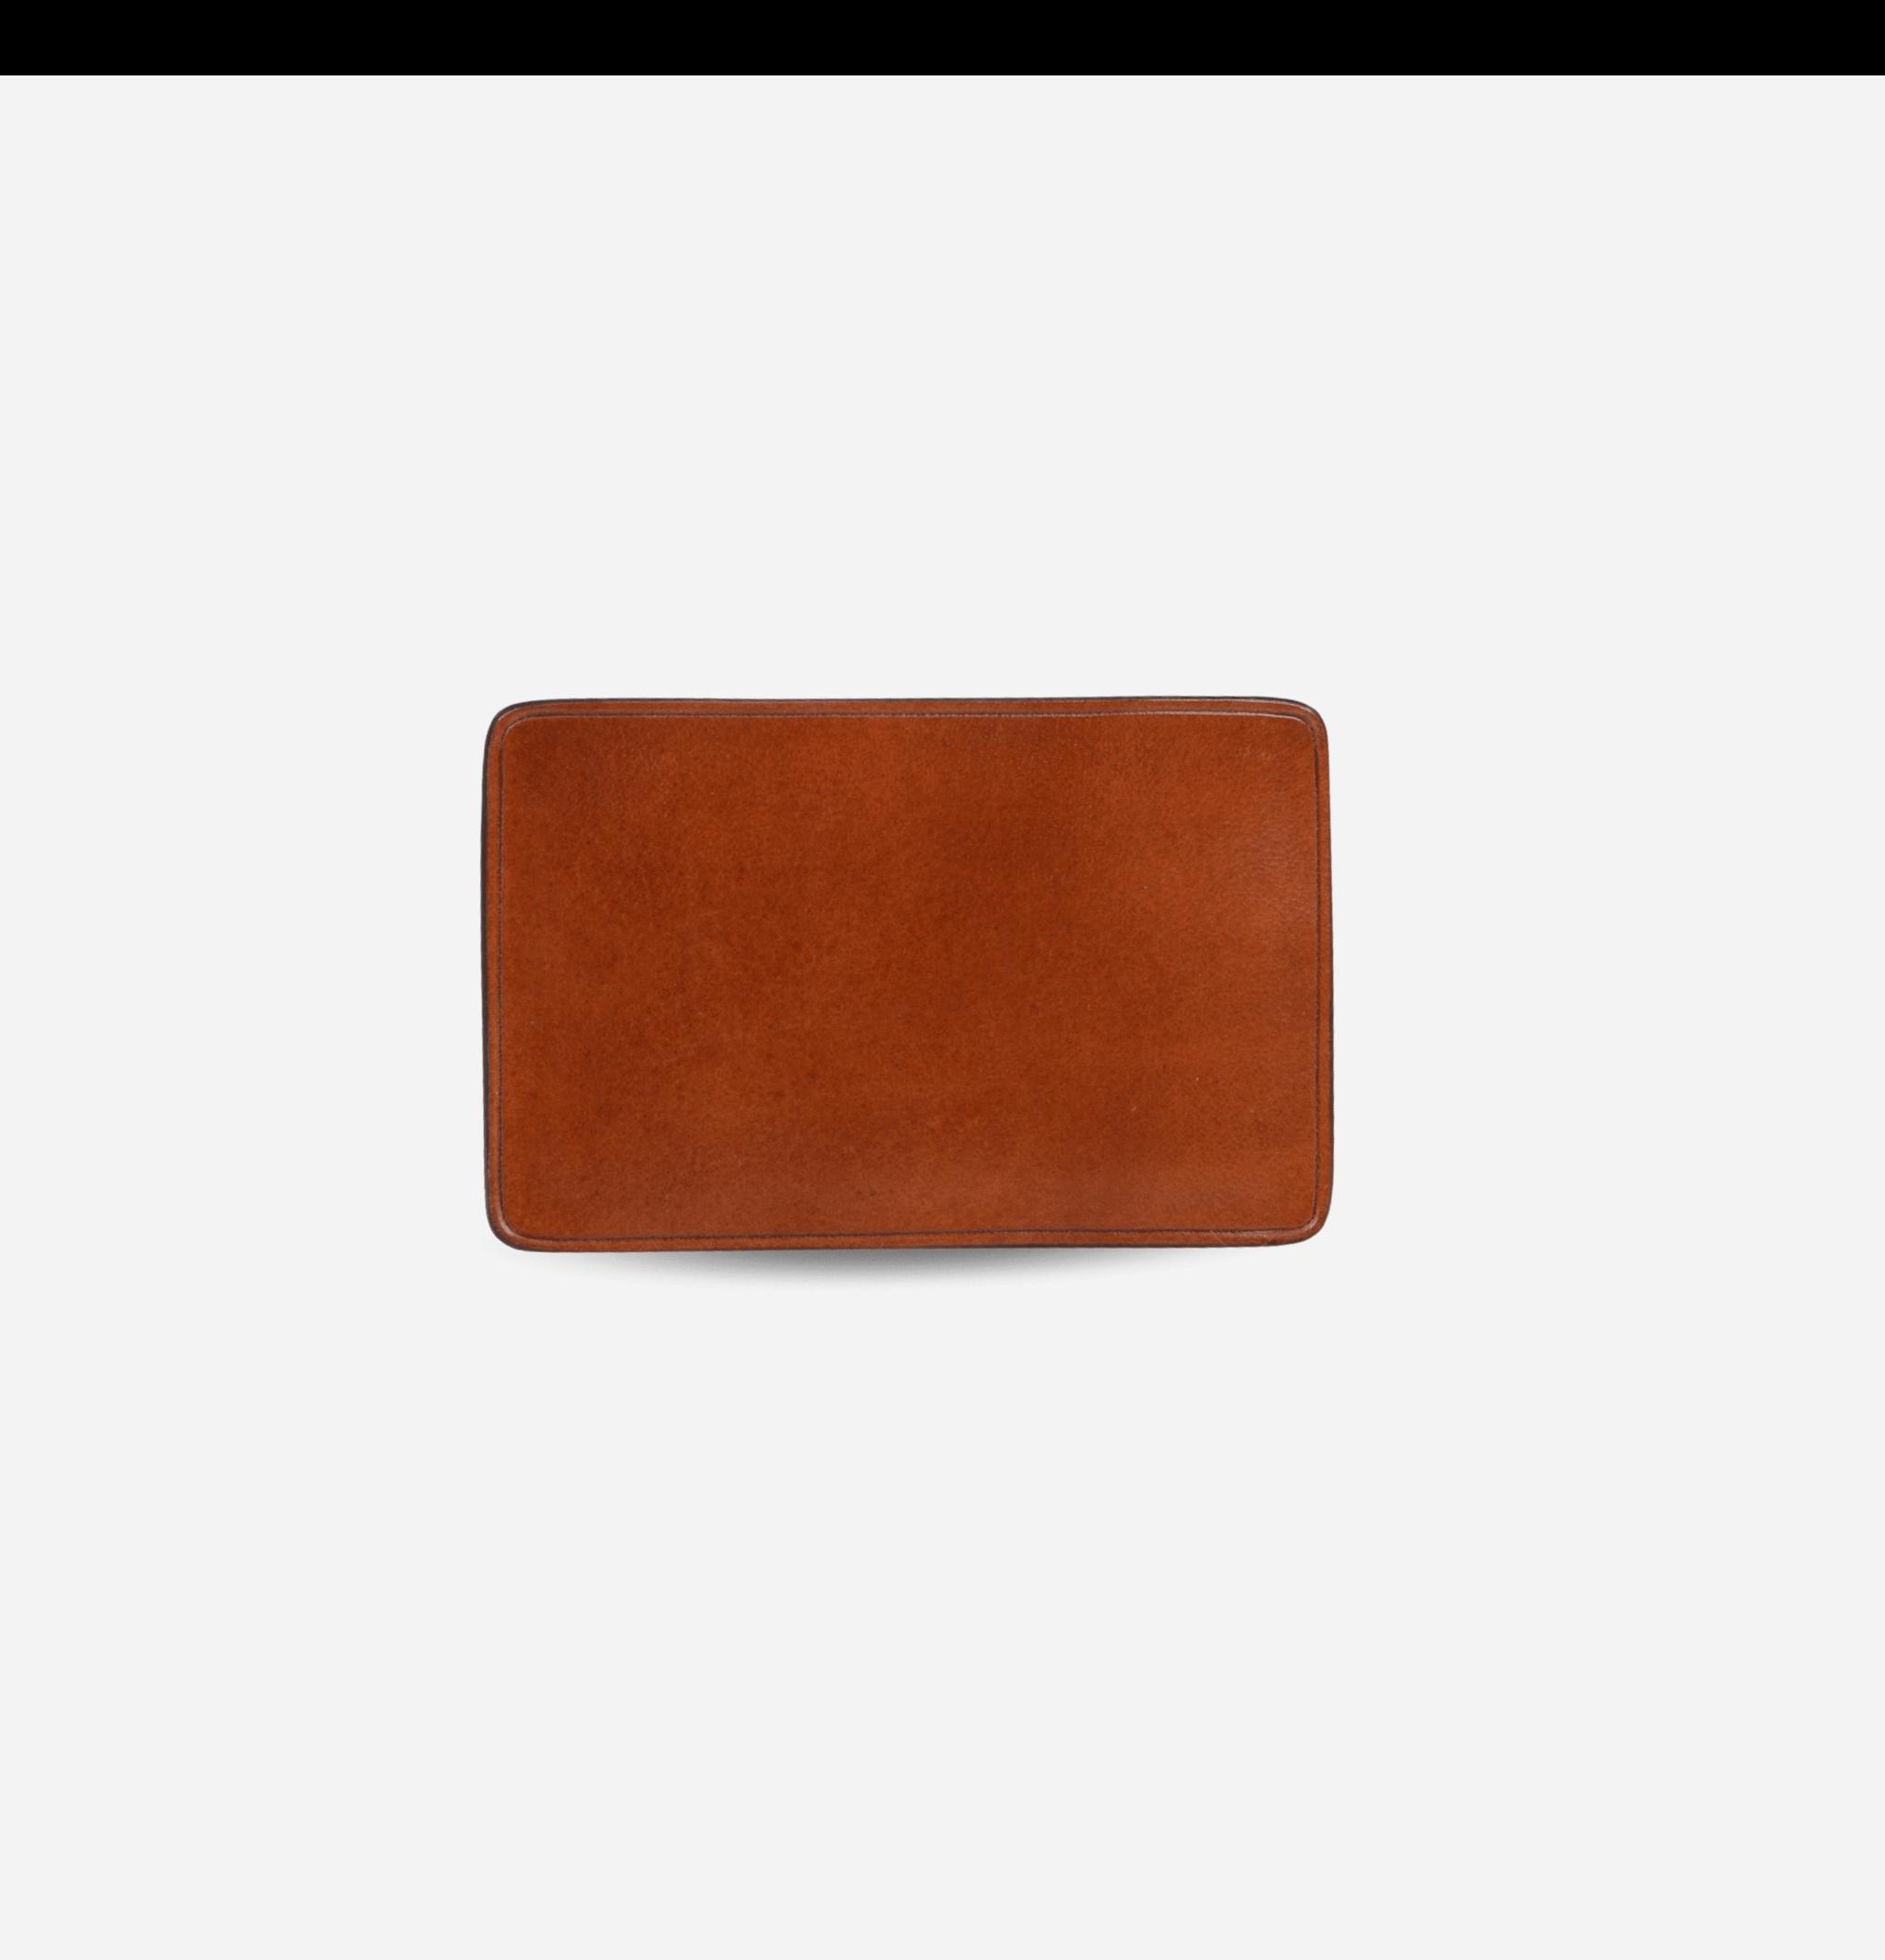 2 Card Case Light Brown